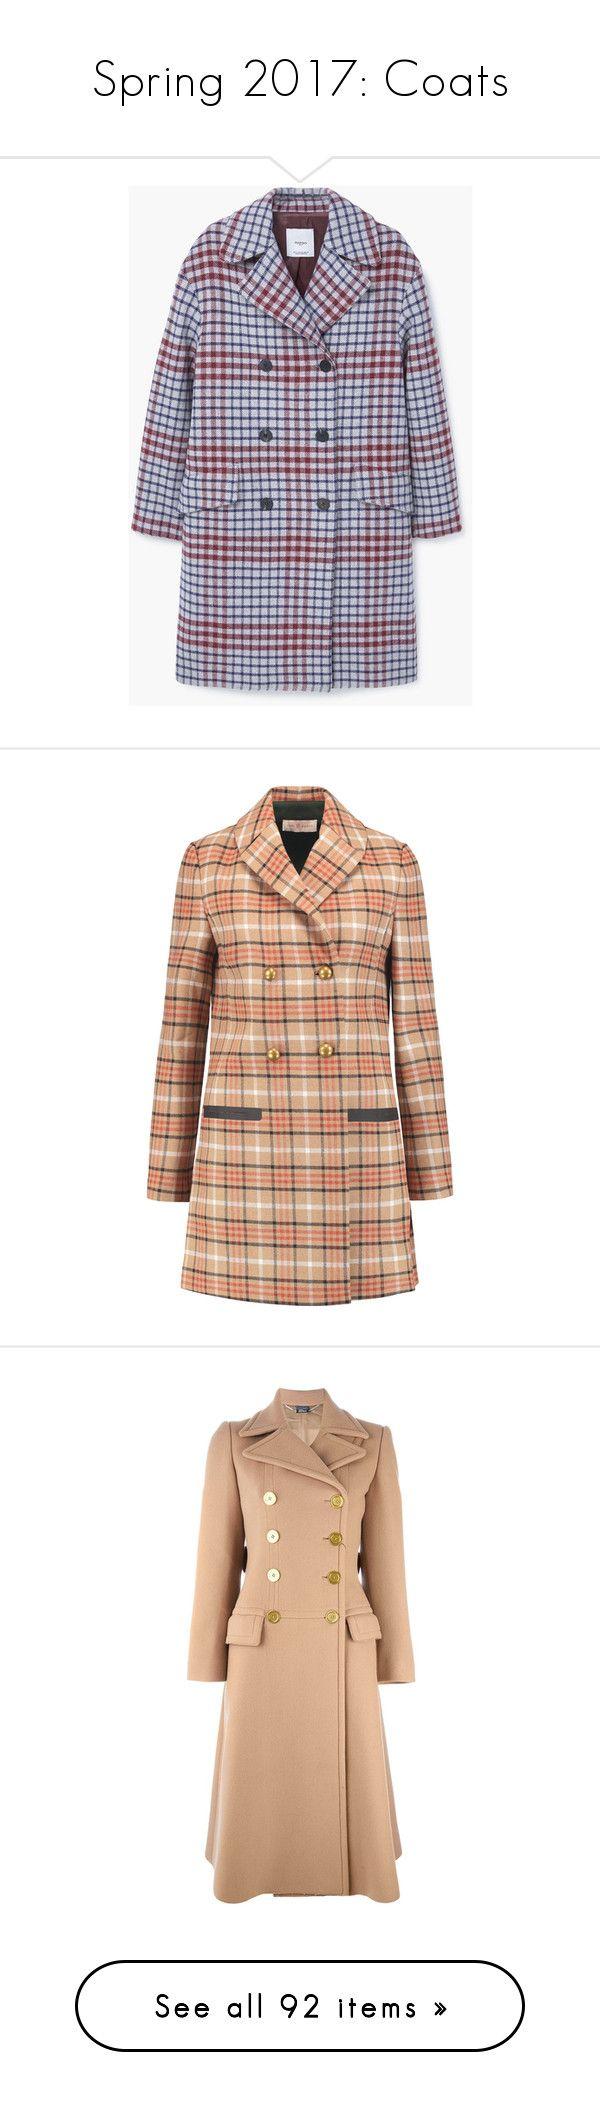 """Spring 2017: Coats"" by lorika-borika on Polyvore featuring outerwear, coats, checkered coat, mango coats, checked coat, wool blend coat, long sleeve coat, jackets, coats & jackets и tan"